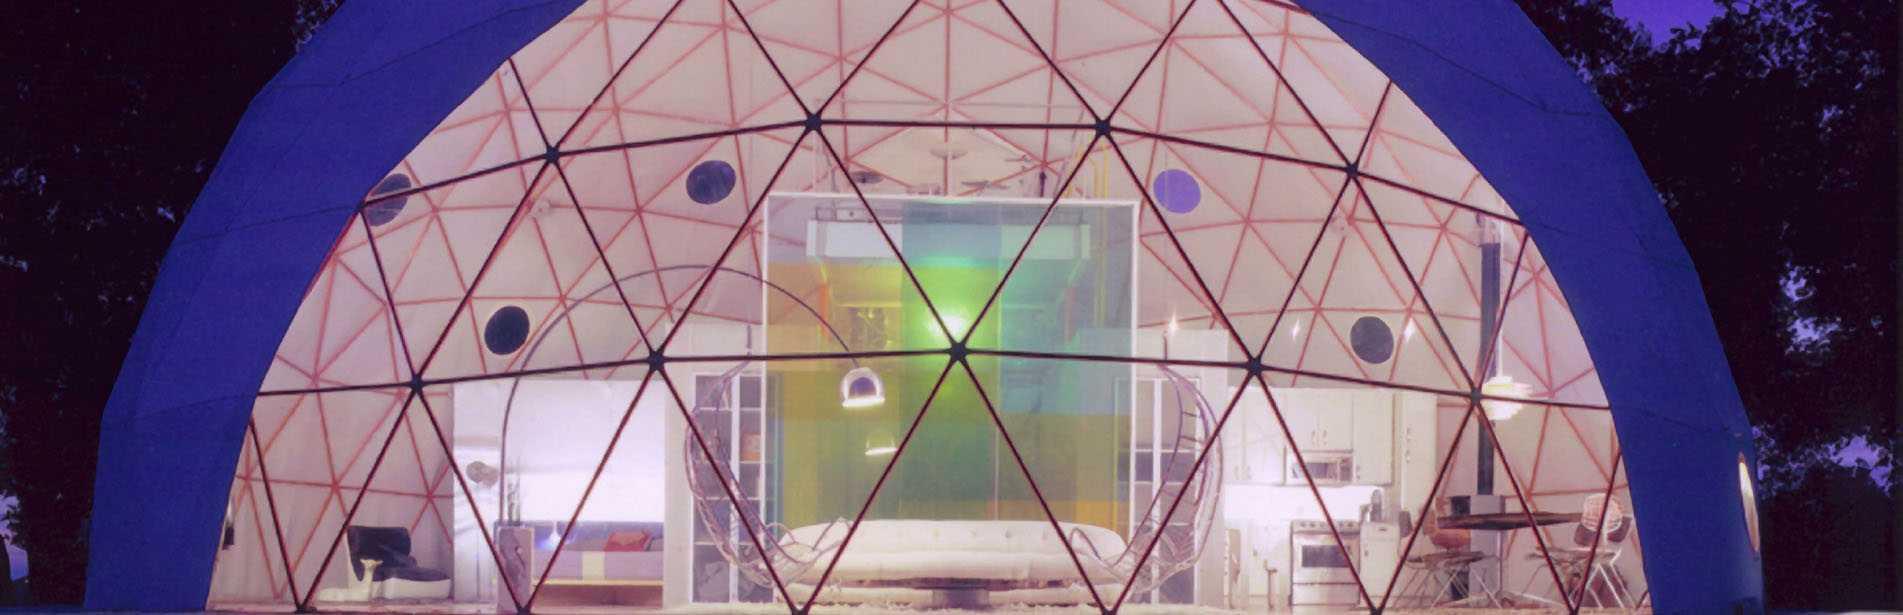 Dome Home - Pacific Domes